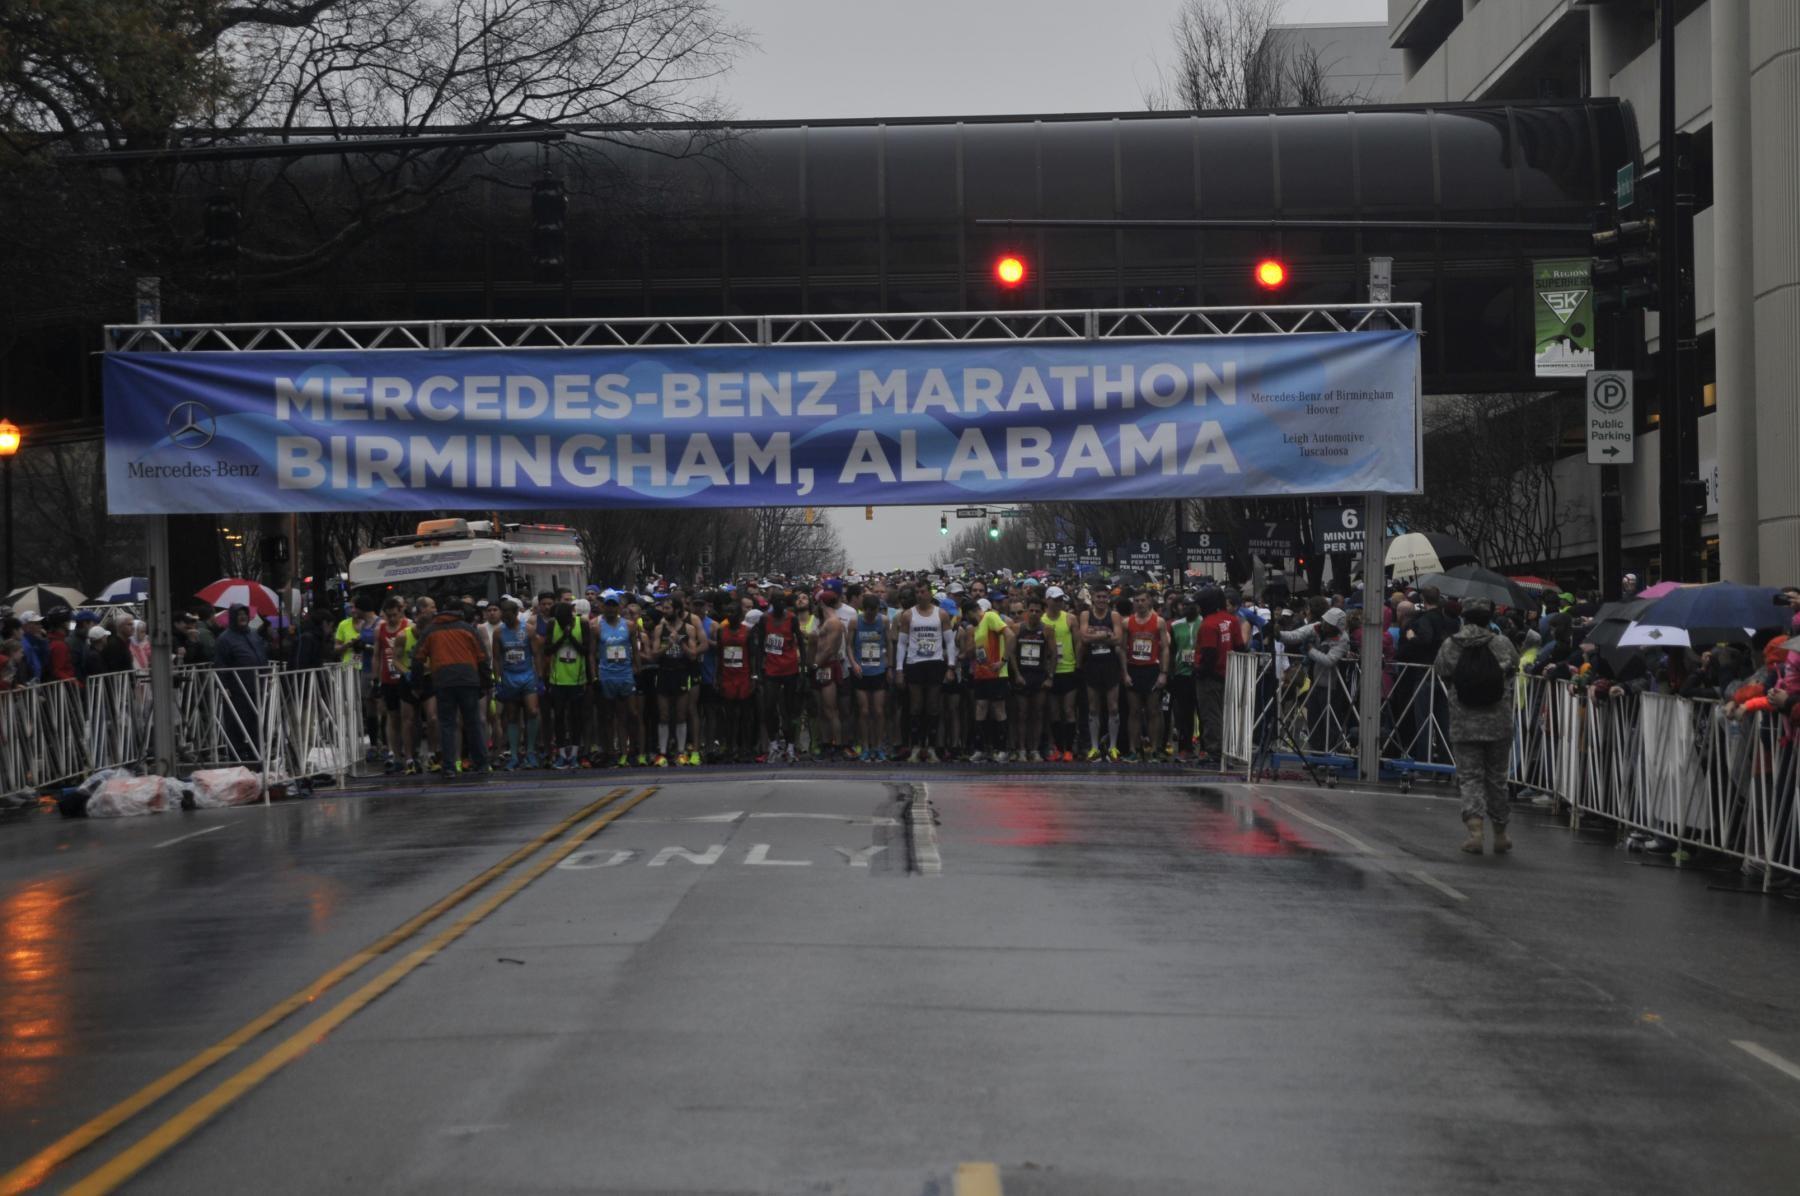 Birmingham based army reserve soldiers run and run and run for Mercedes benz marathon birmingham